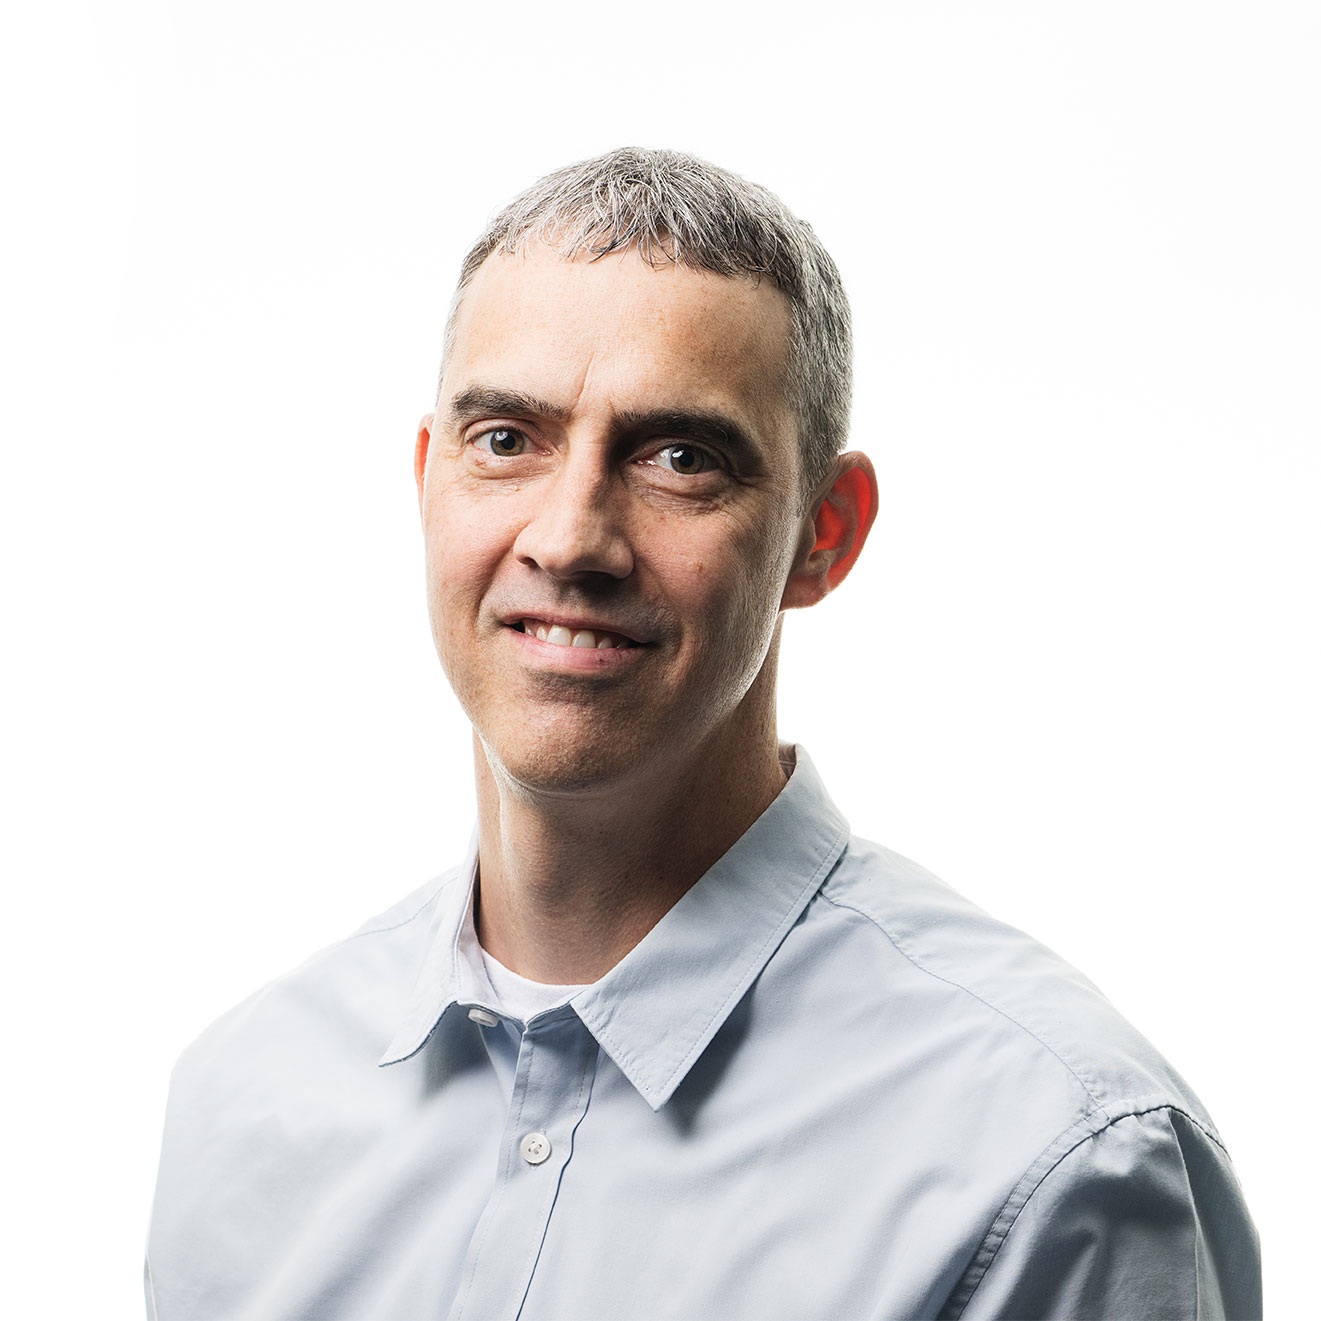 Matt Friedersdorf